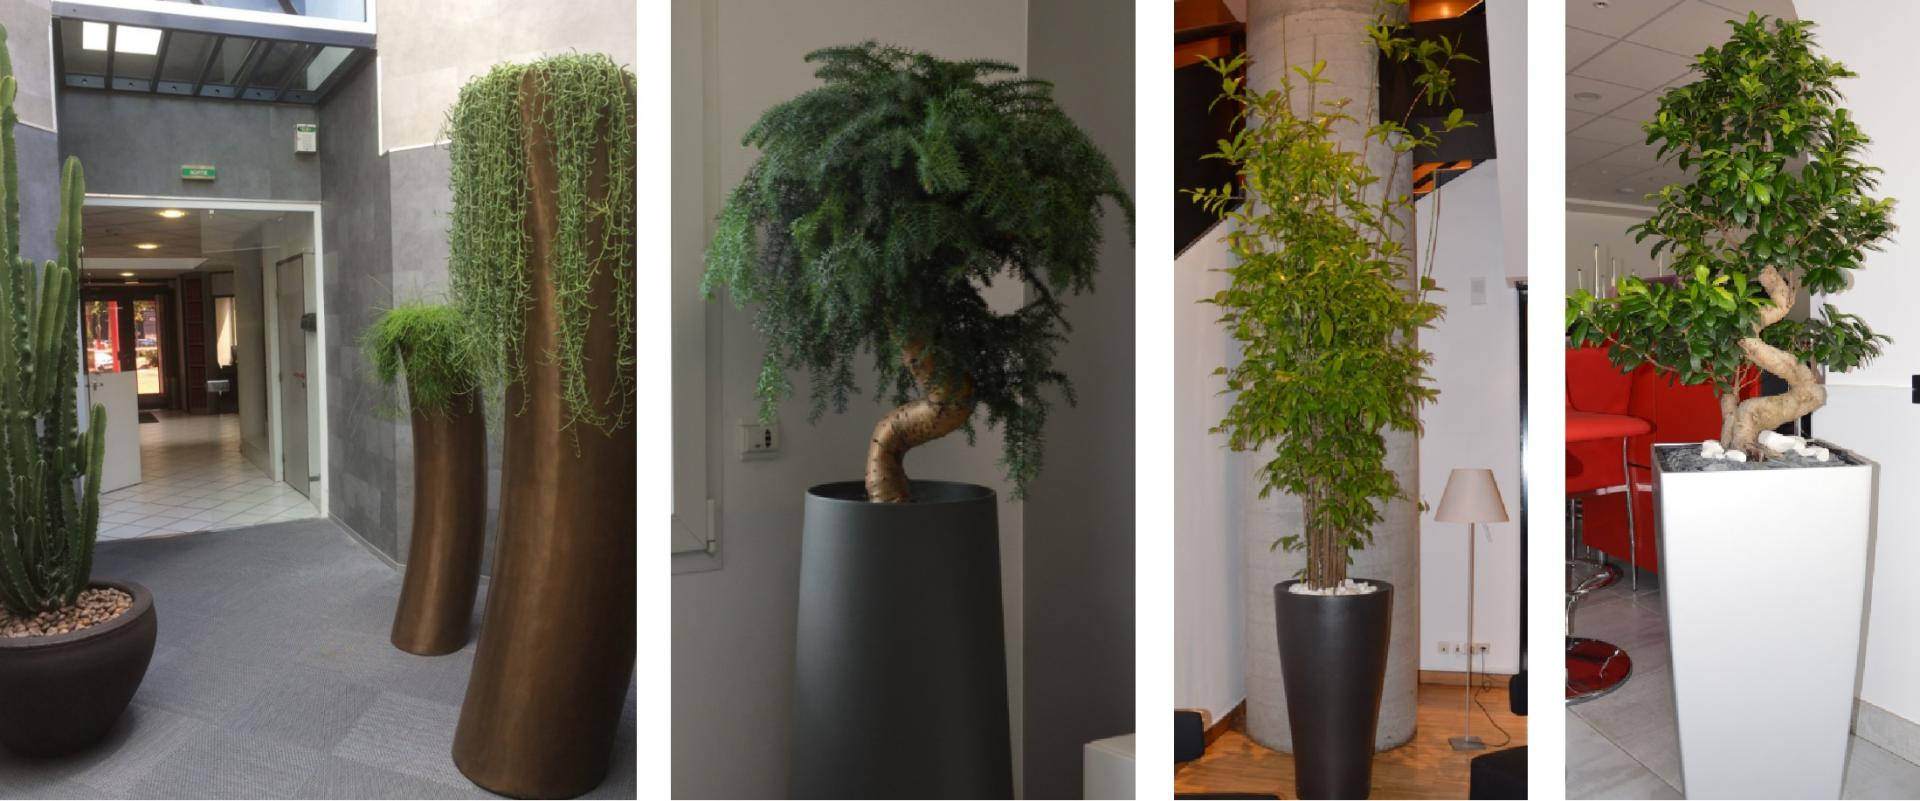 Plantes interieures